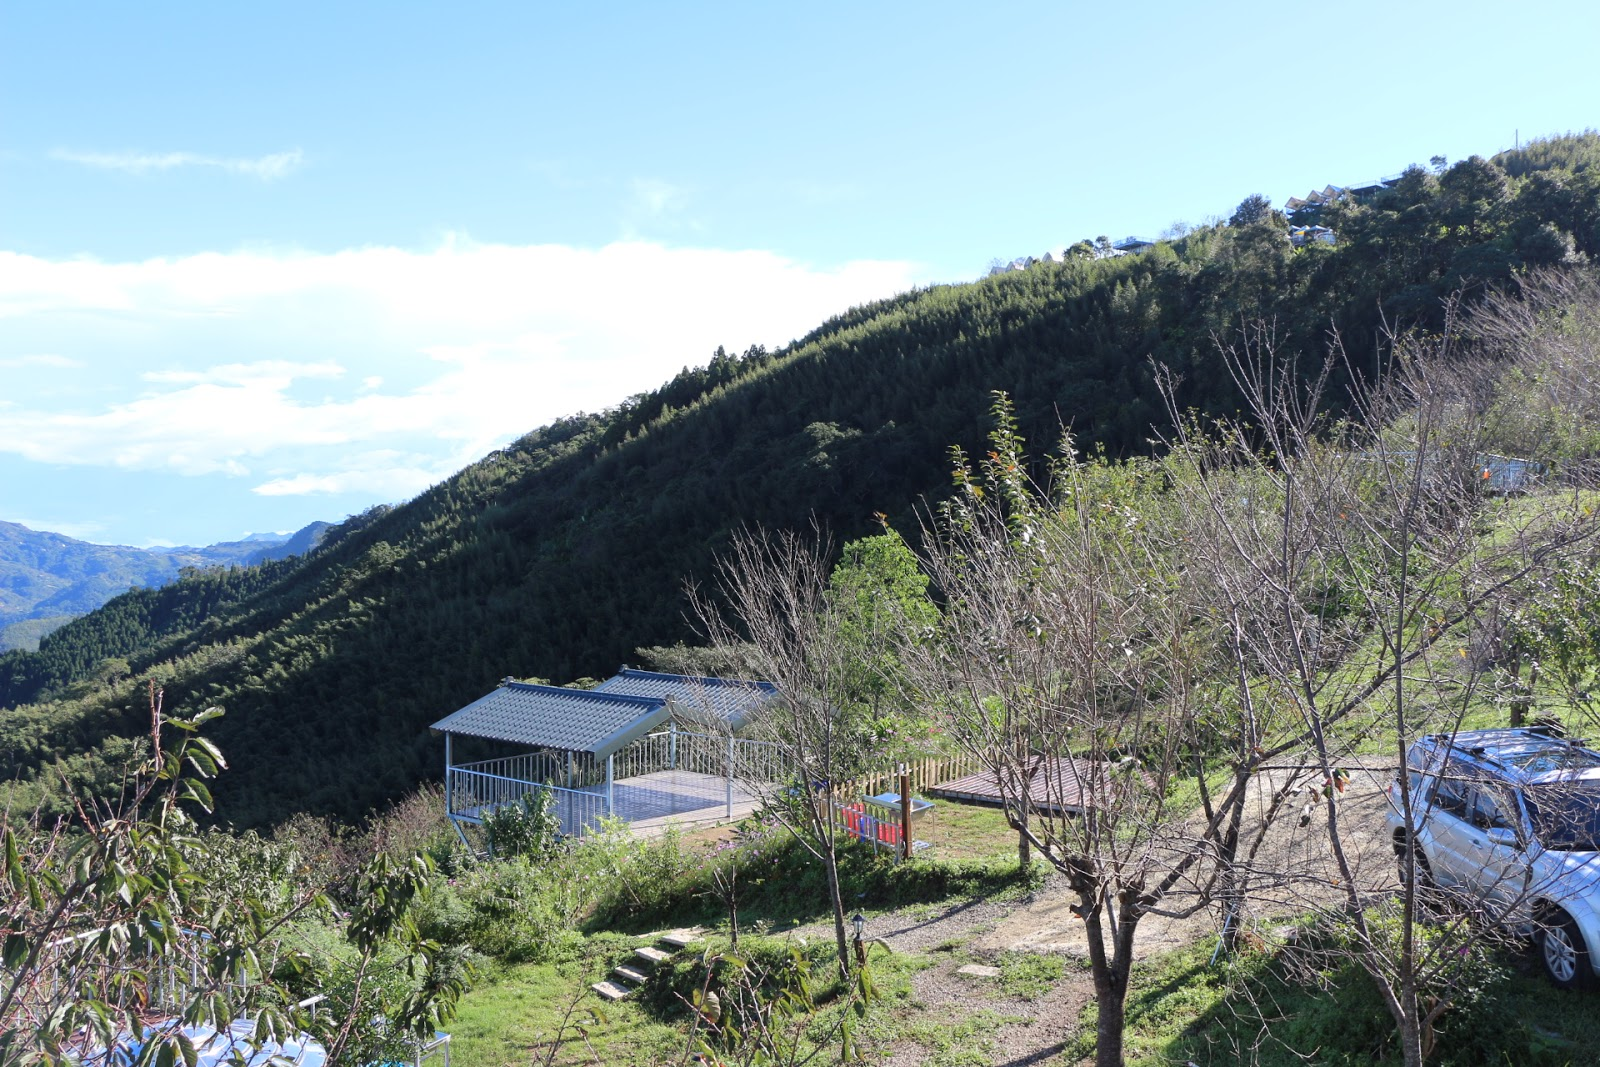 camptw 露營在臺灣: 美好景色在B612夕淞度日